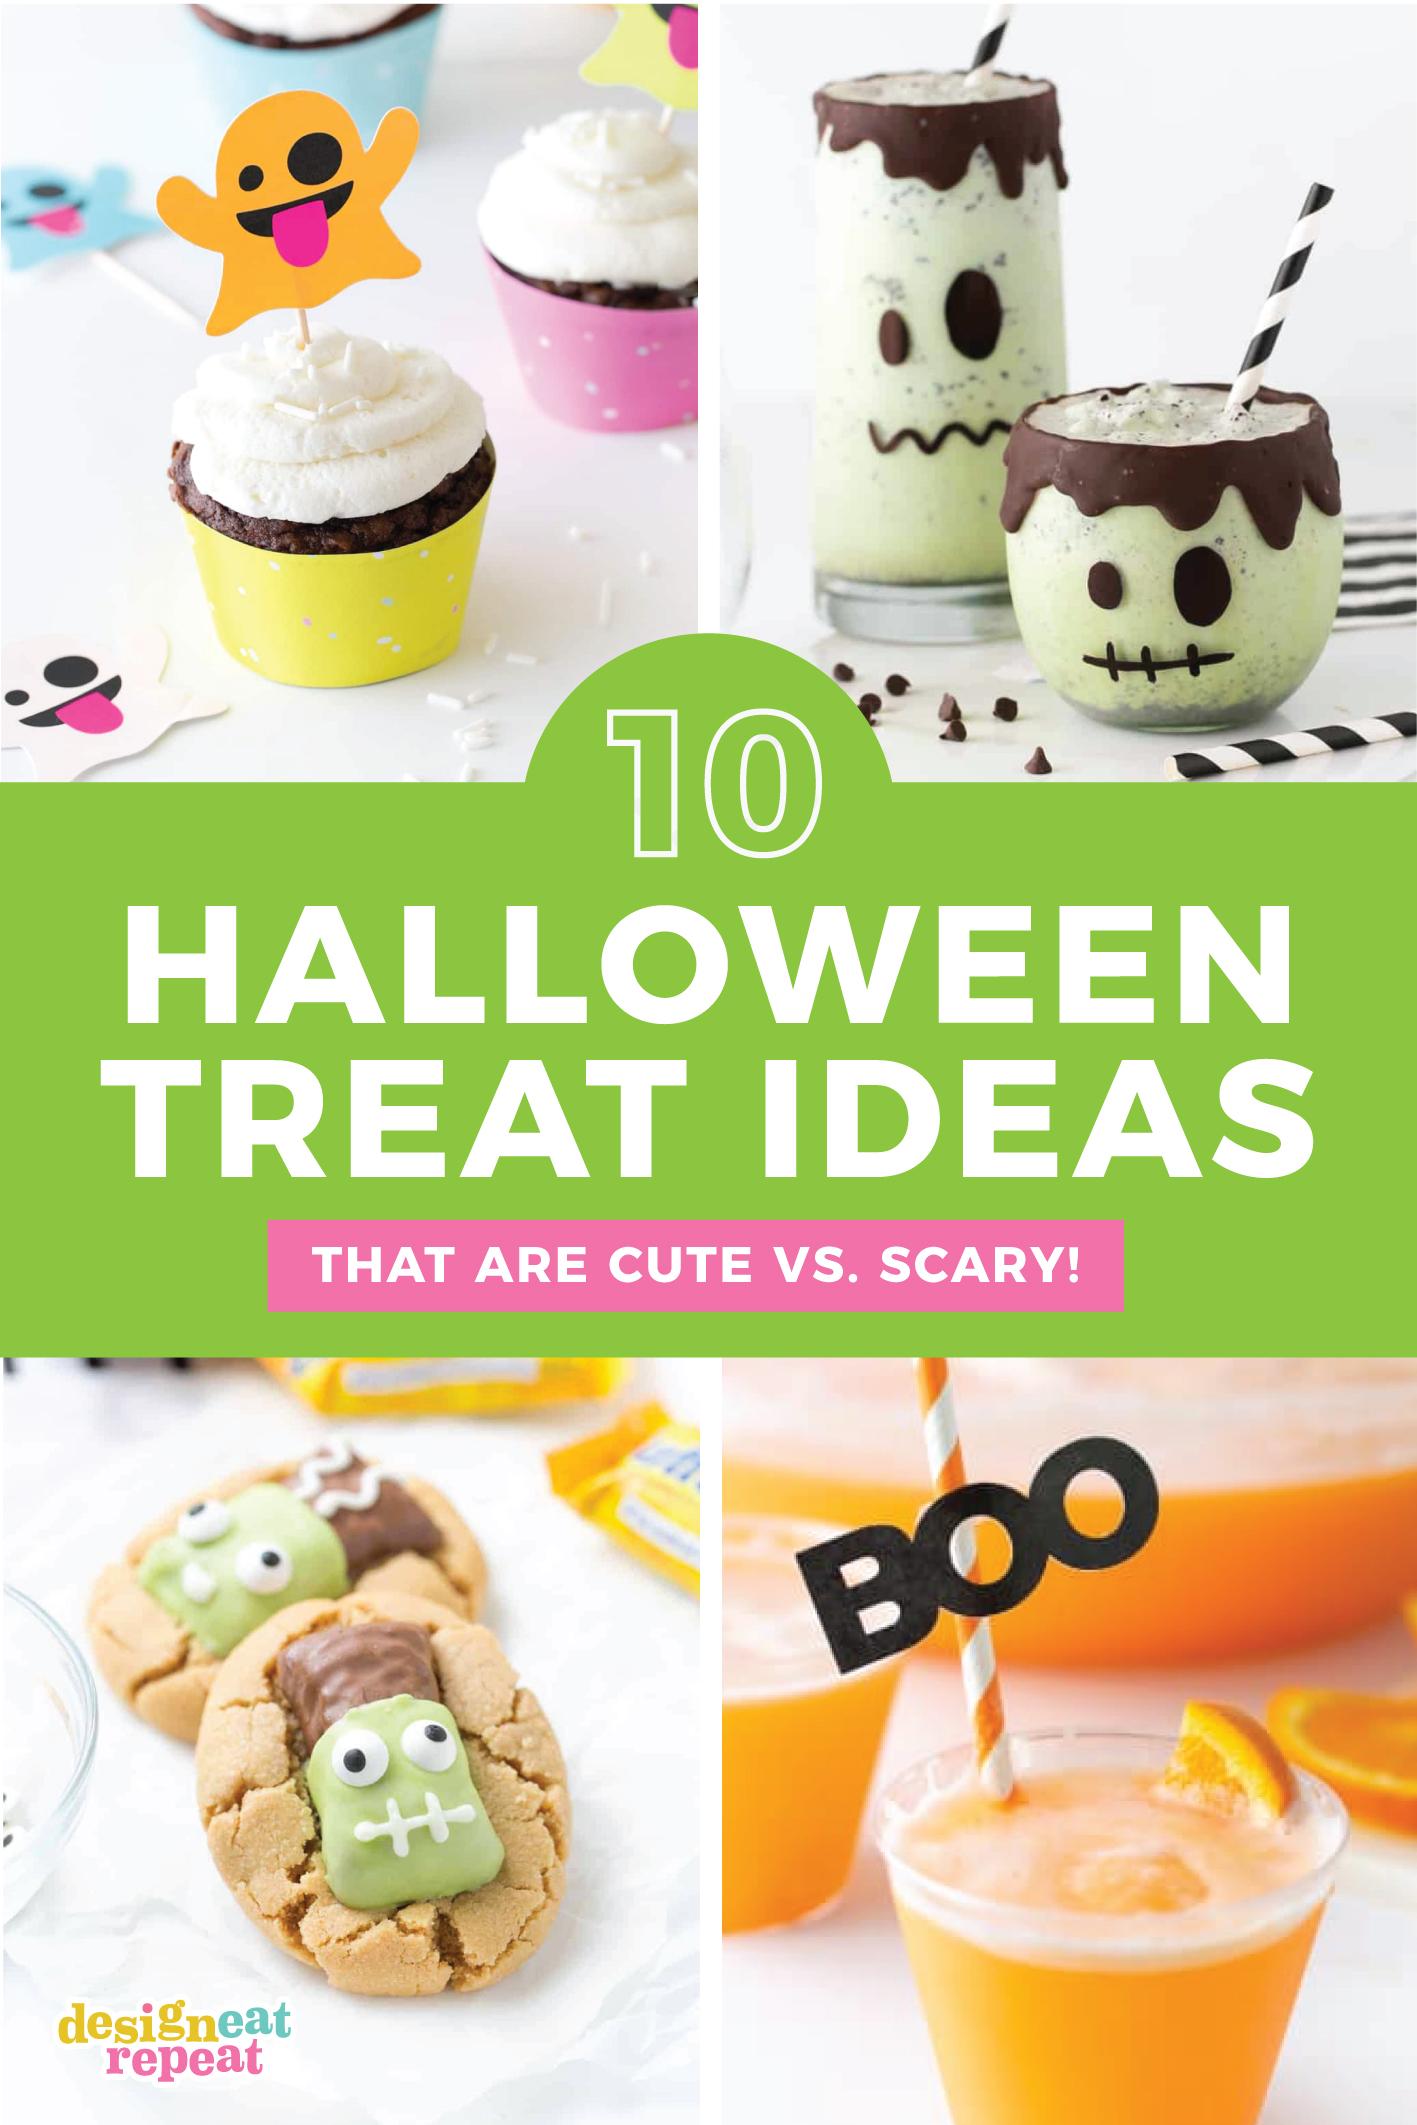 10 Cute & Easy Halloween Treats